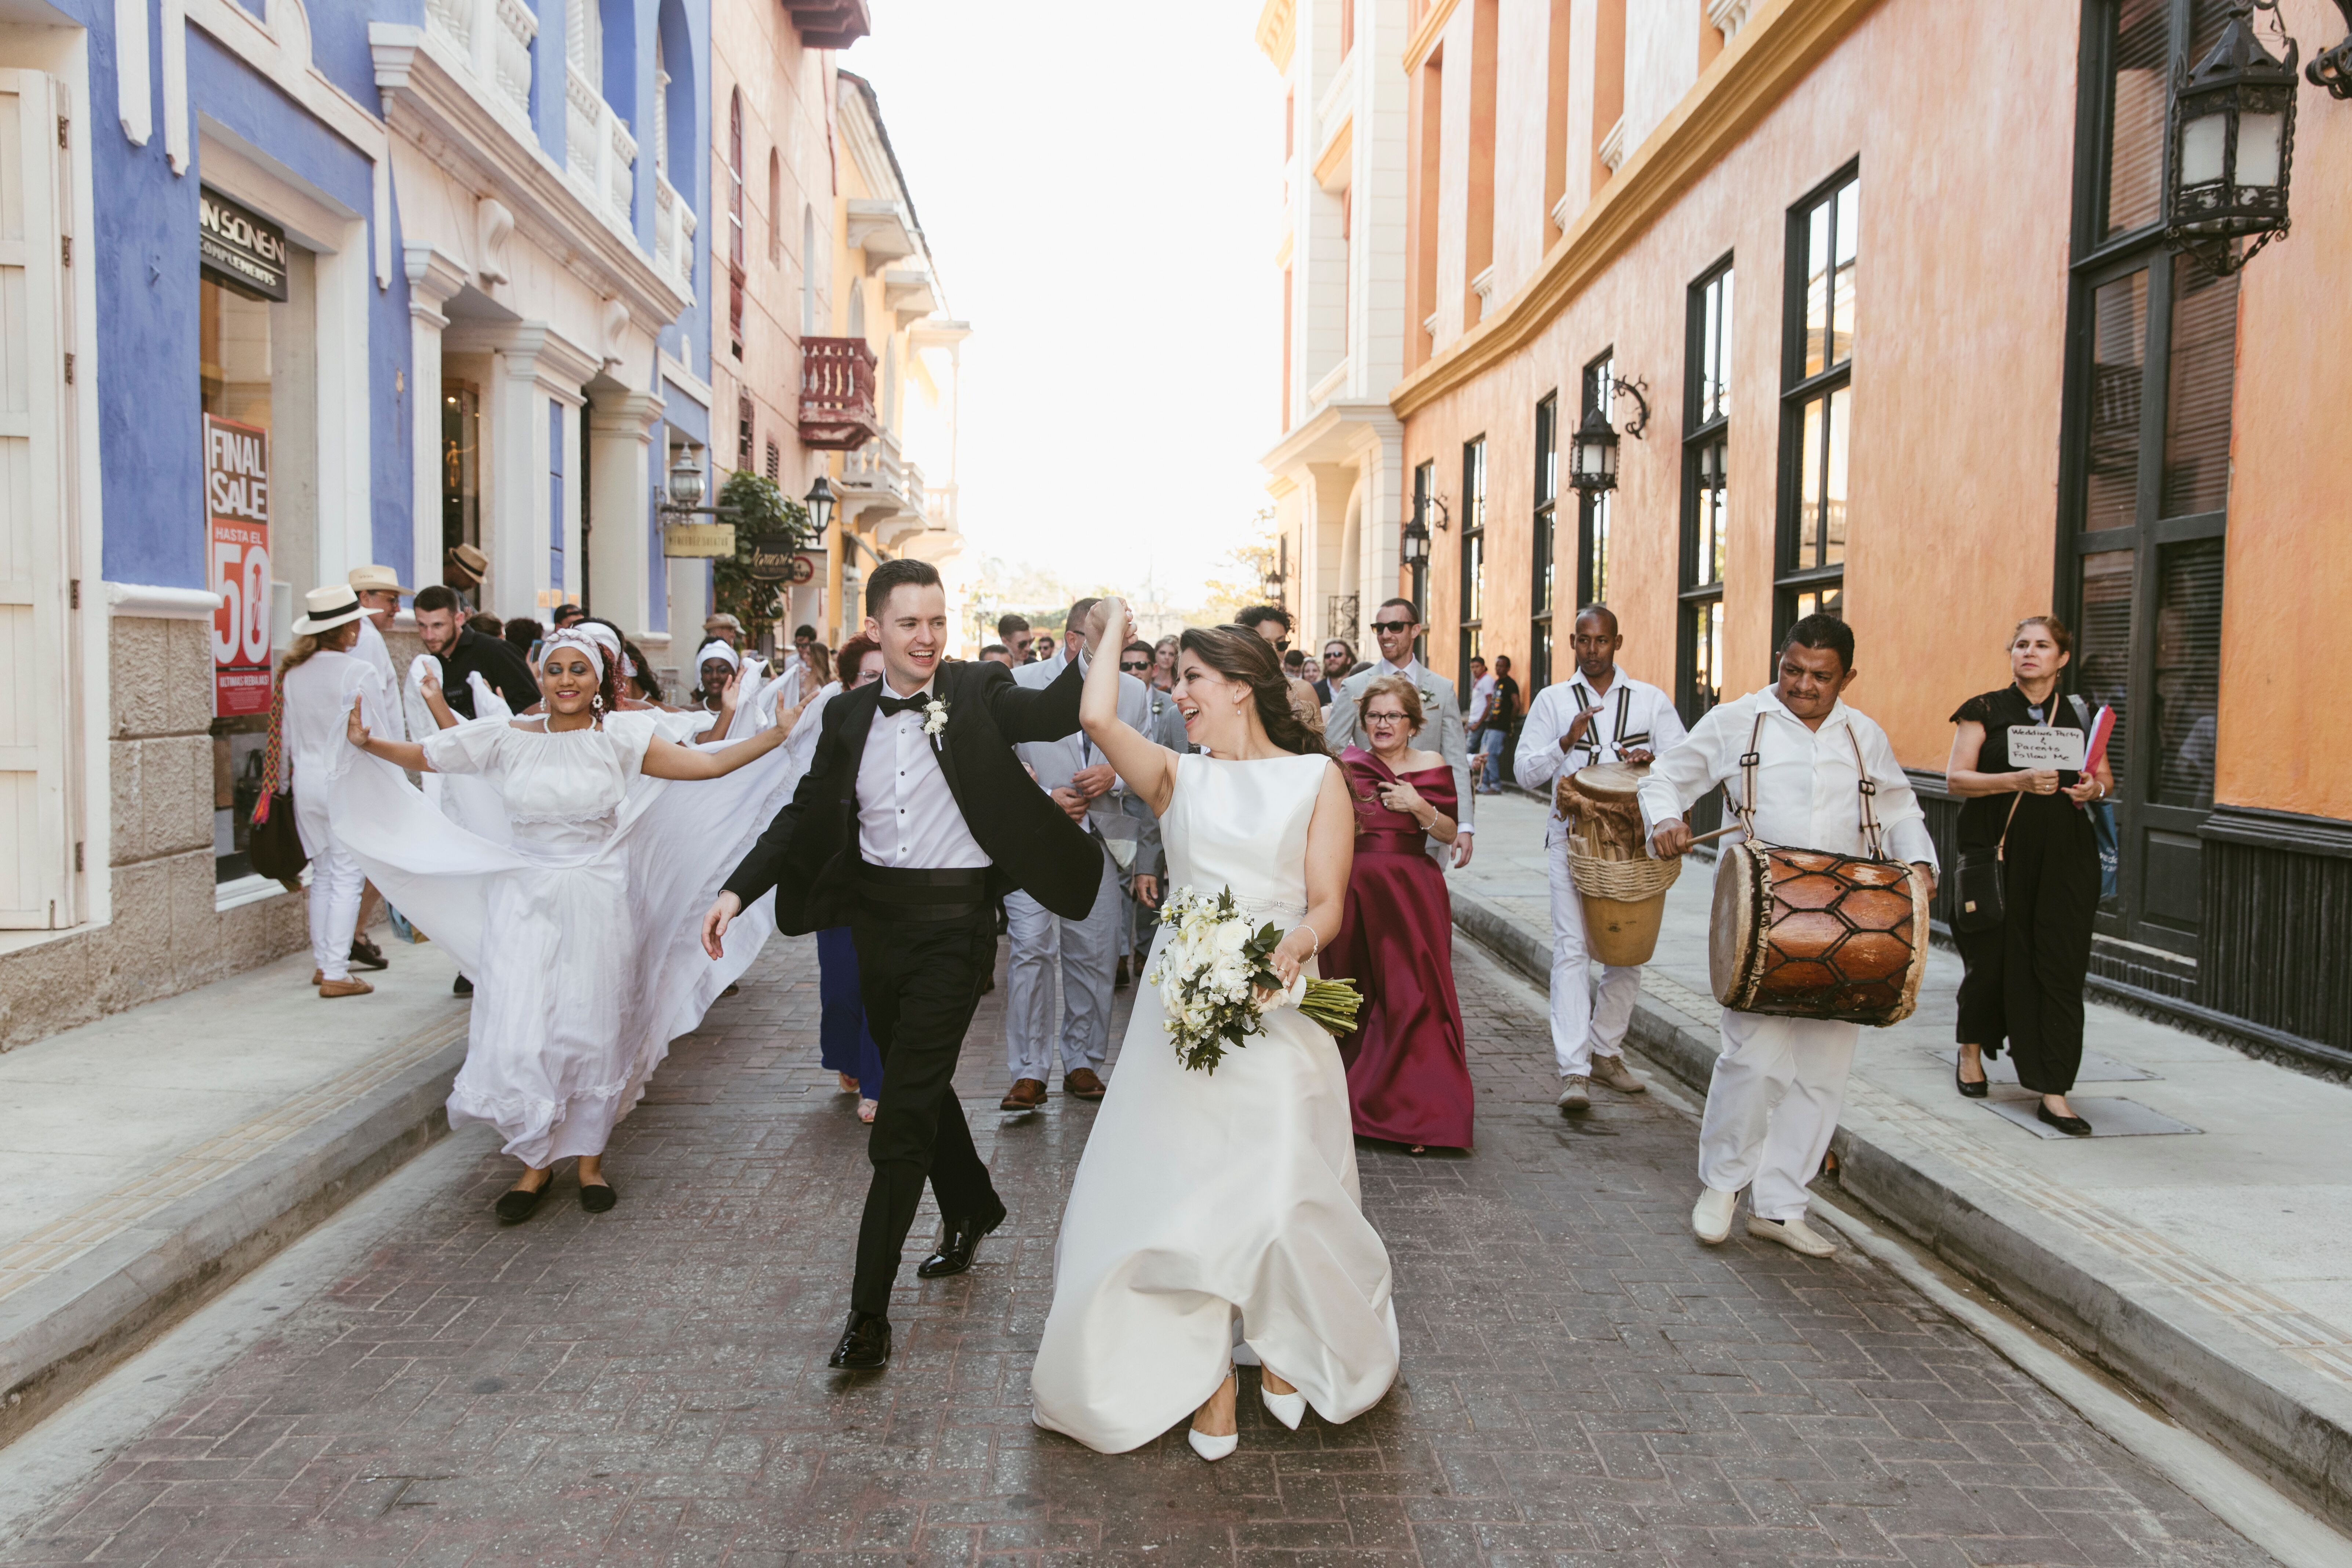 A Rustic Destination Wedding At A Historic Estate In Cartagena